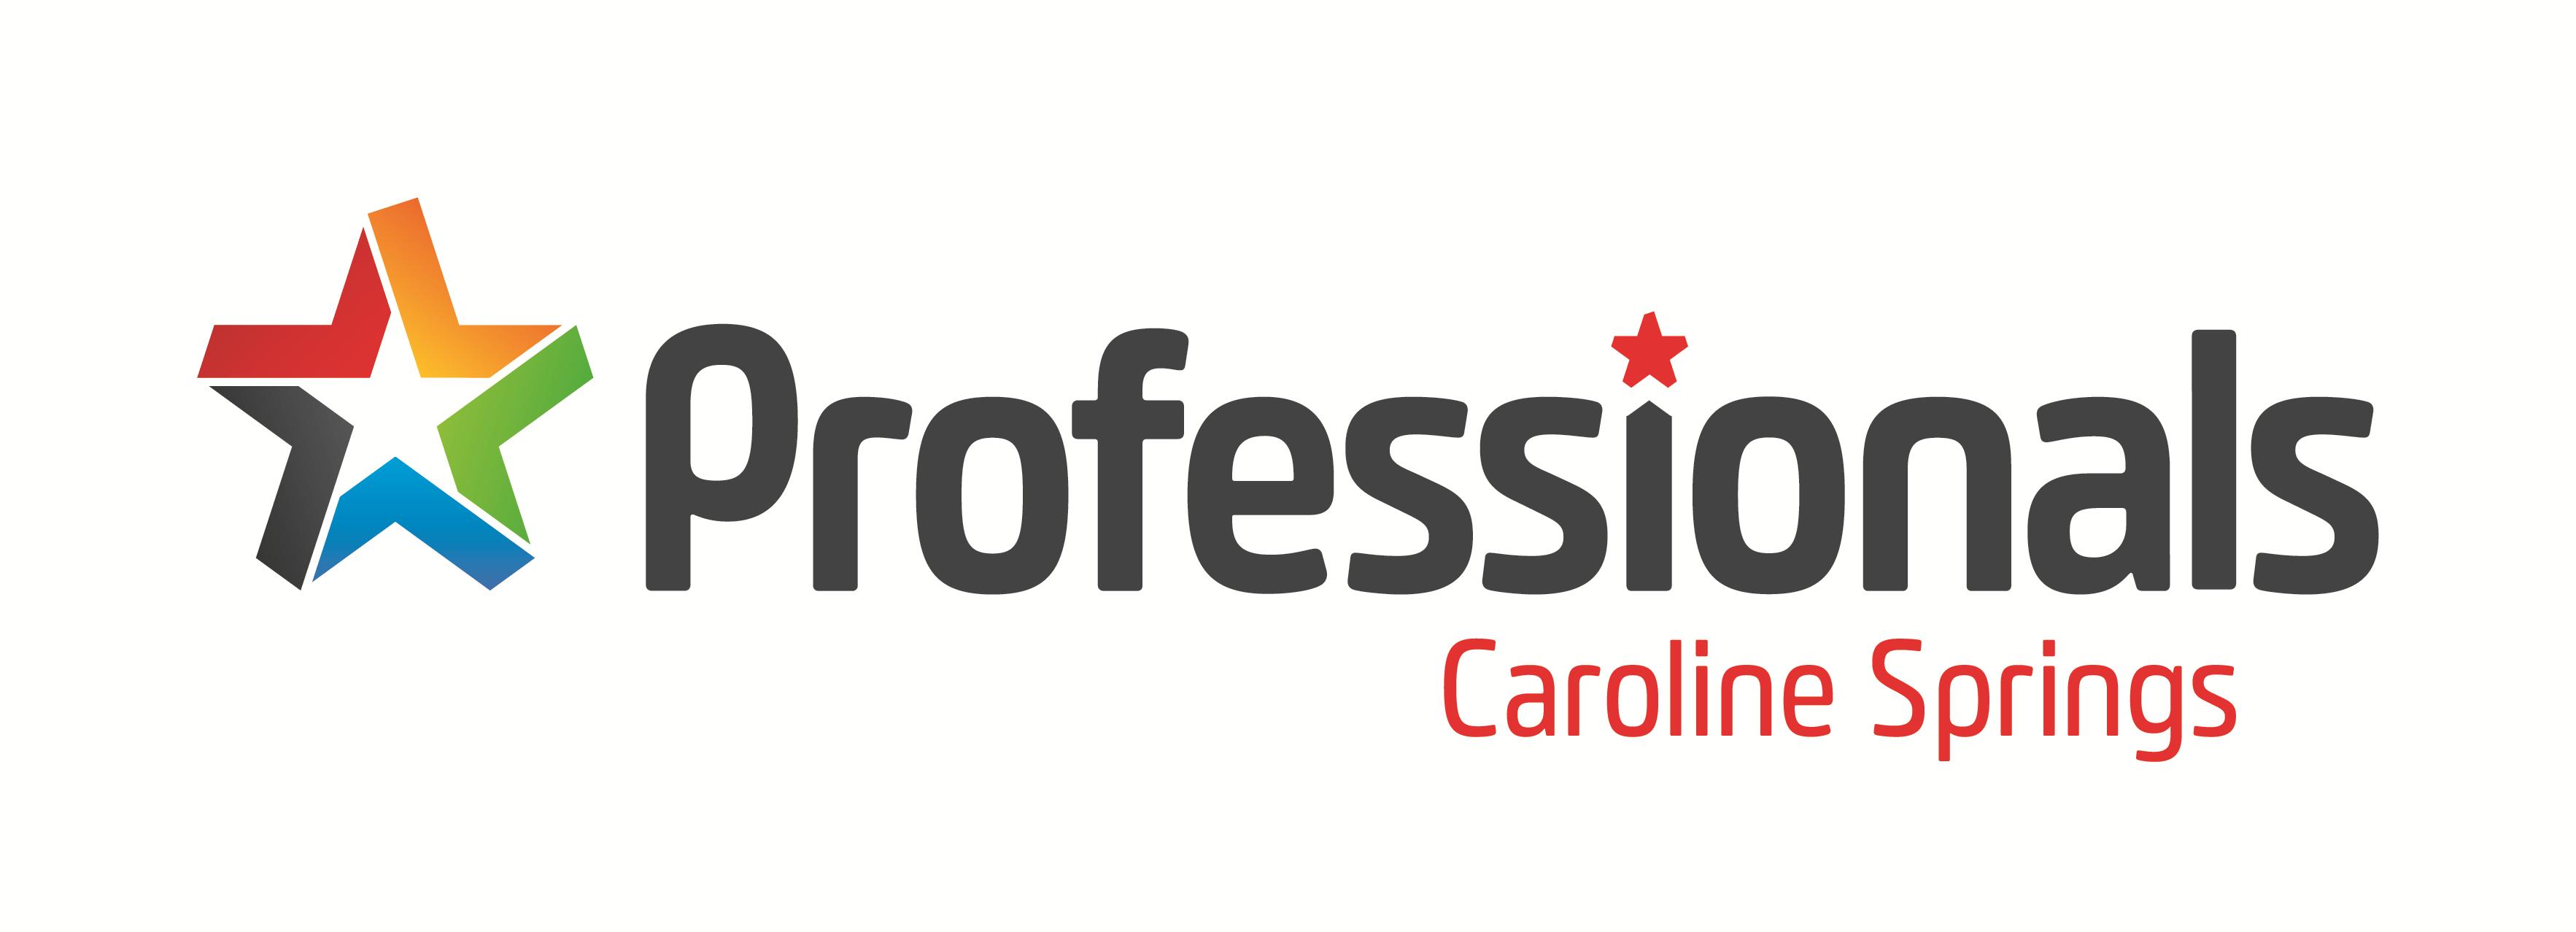 Professionals Caroline Springs, Caroline Springs, 3023